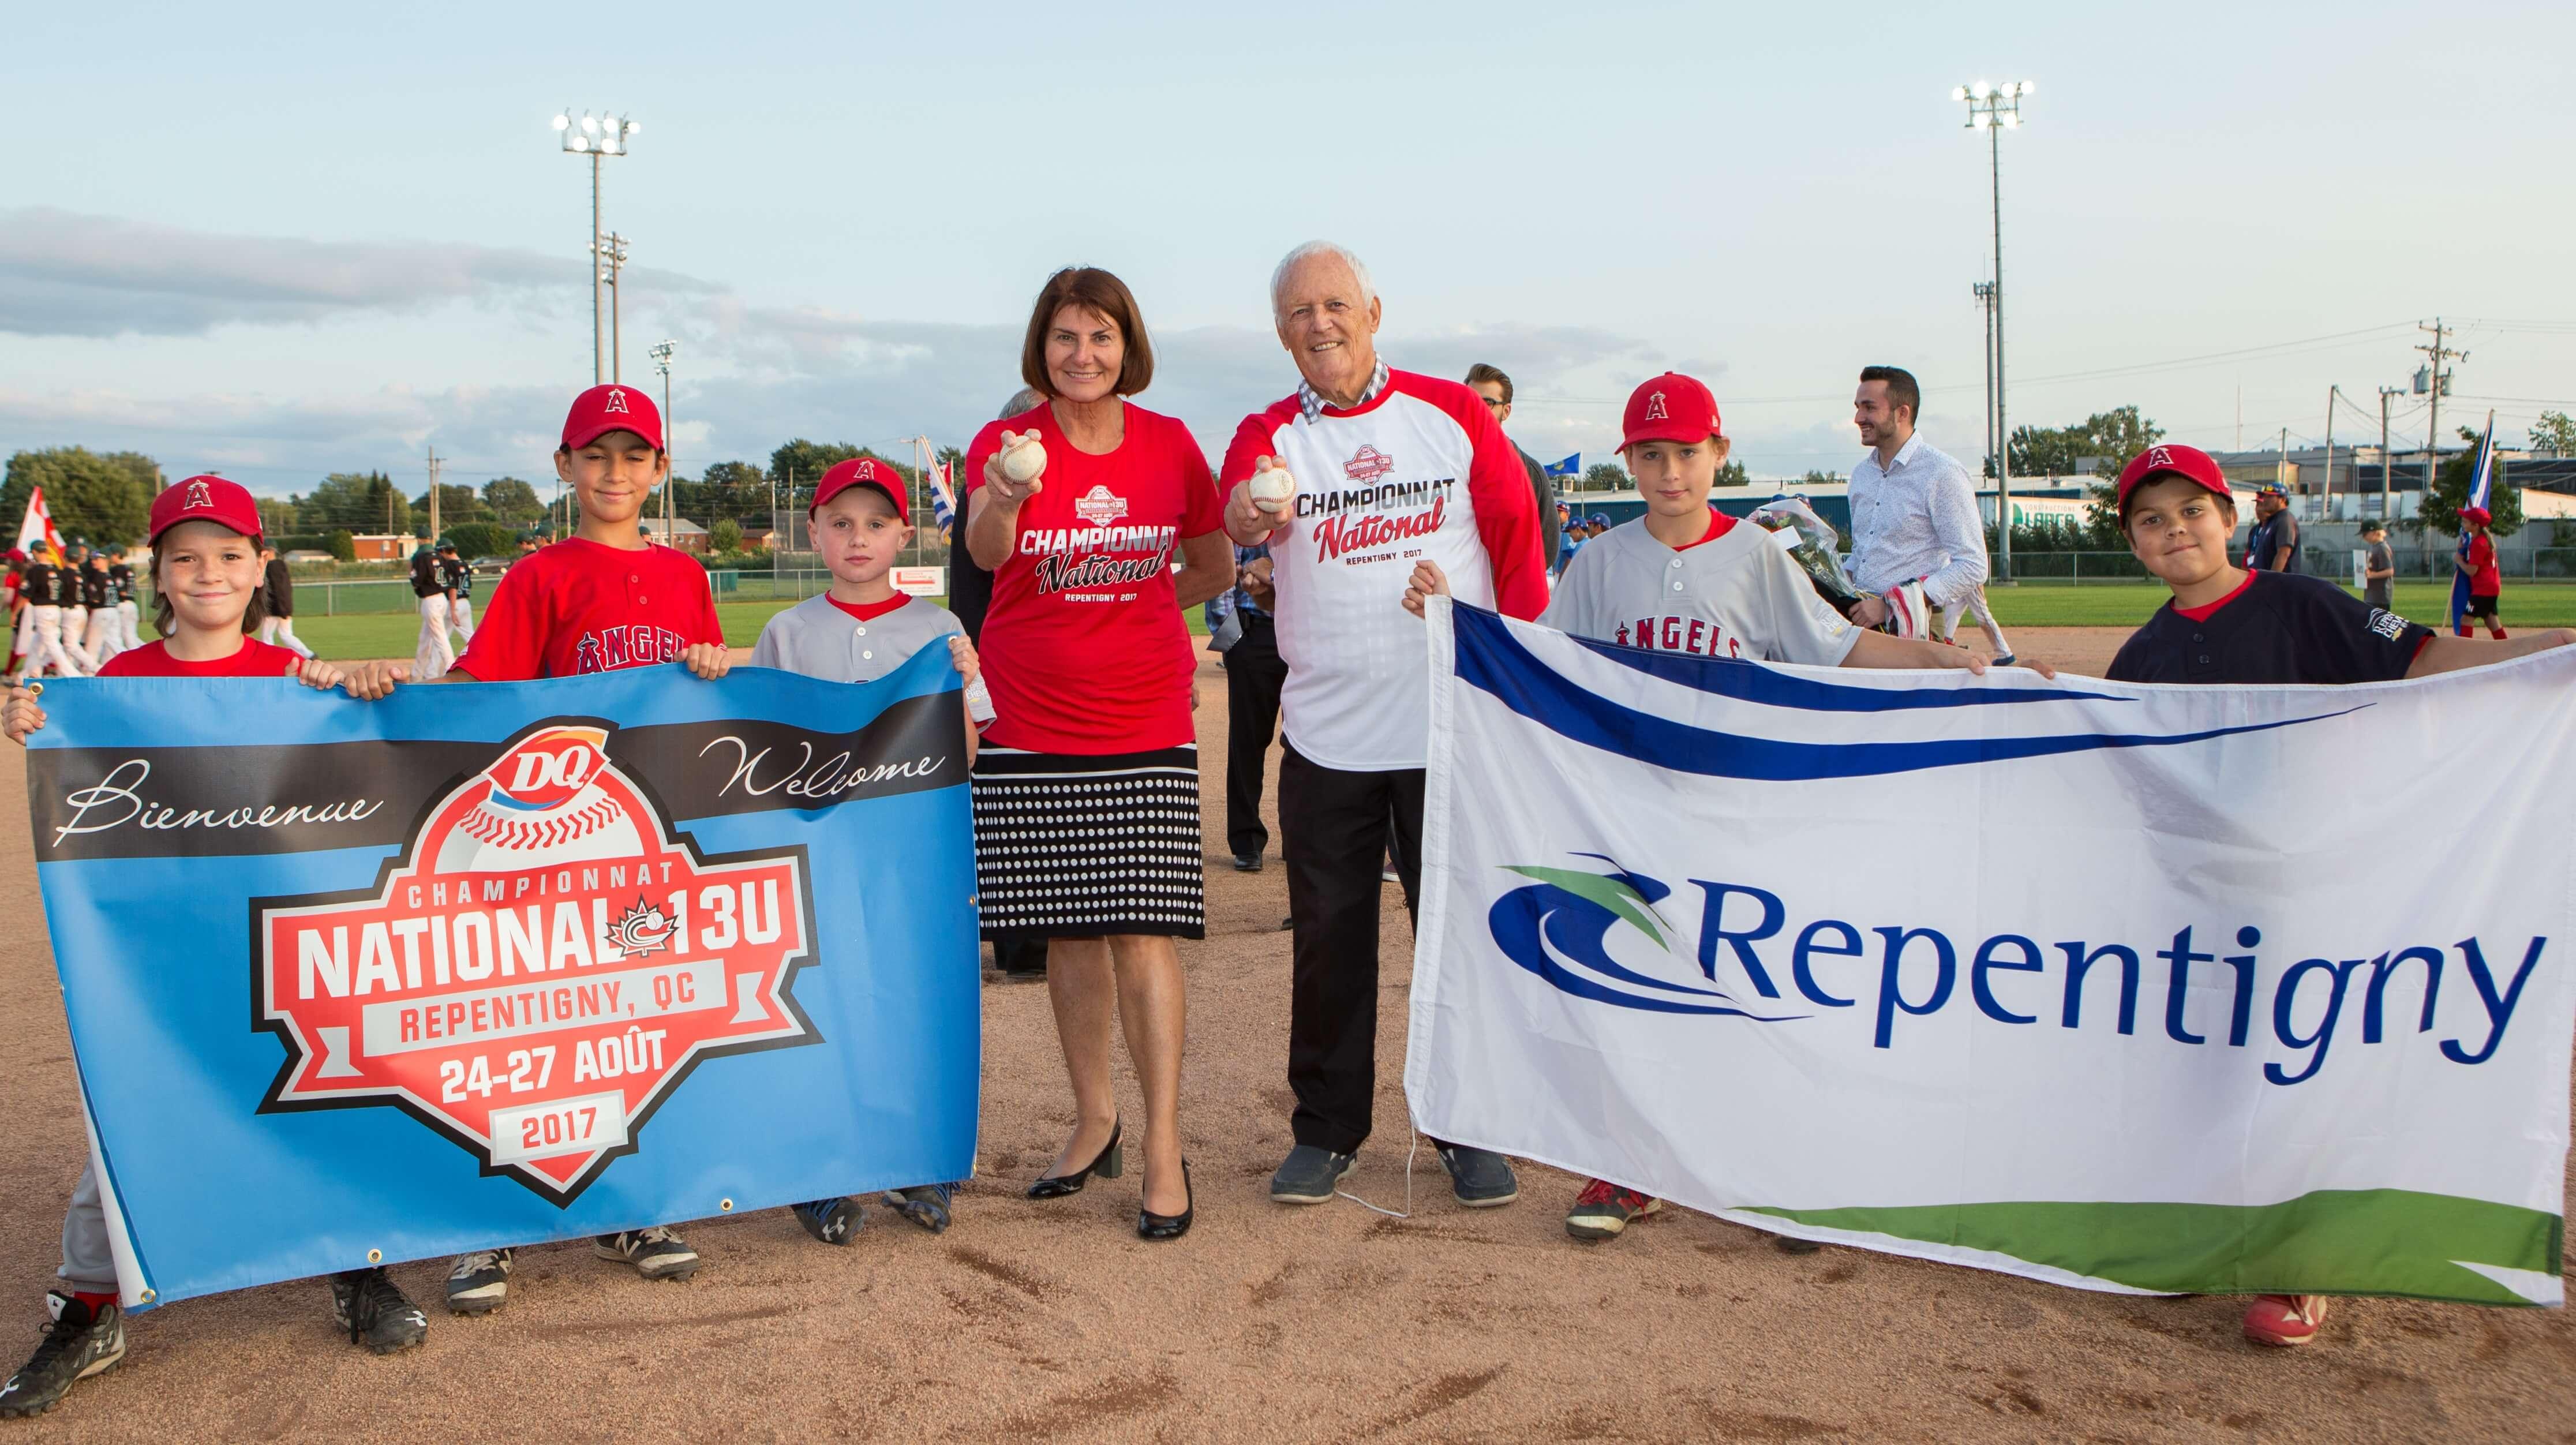 Championnat baseball Repentigny